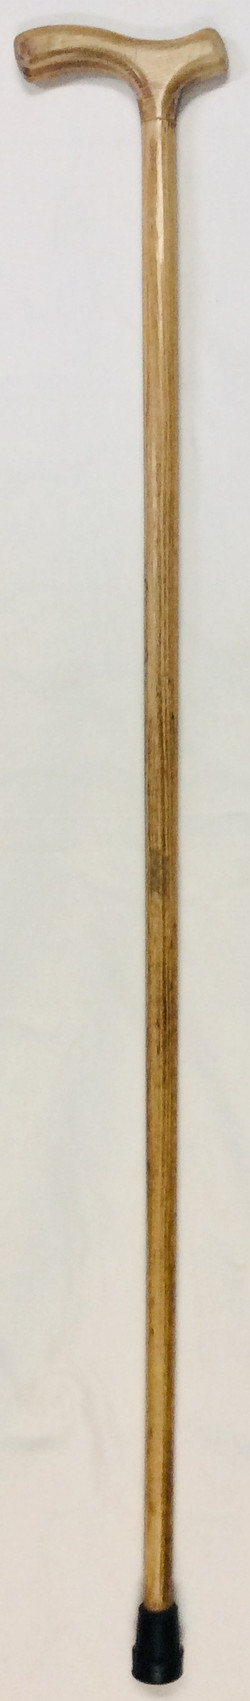 Old light brown wood fritz cane